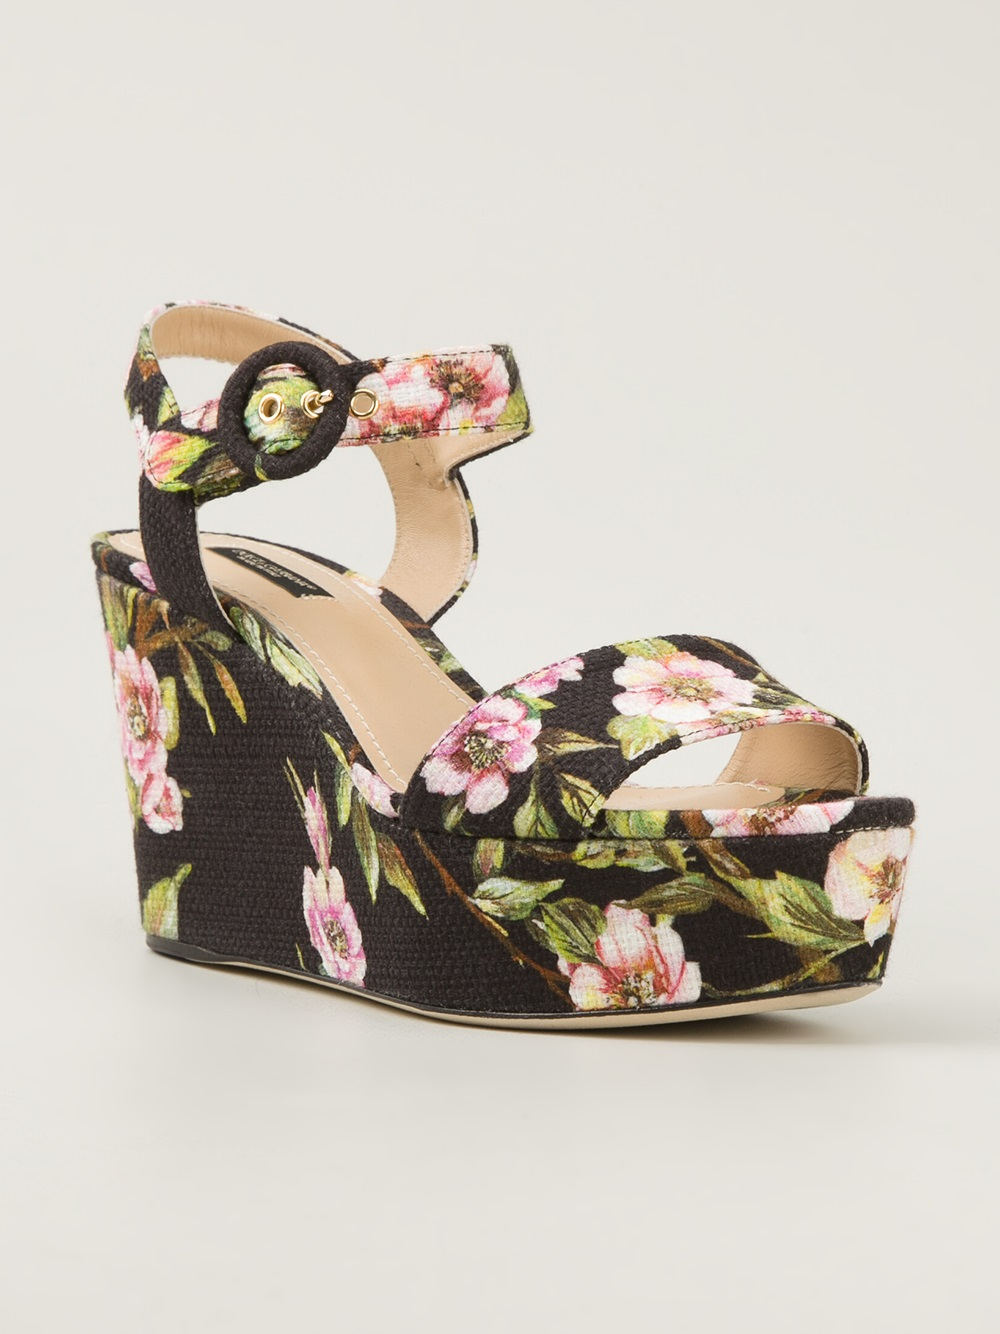 high quality cheap online sale online shopping Dolce & Gabbana floral wedged sandals JPMYz